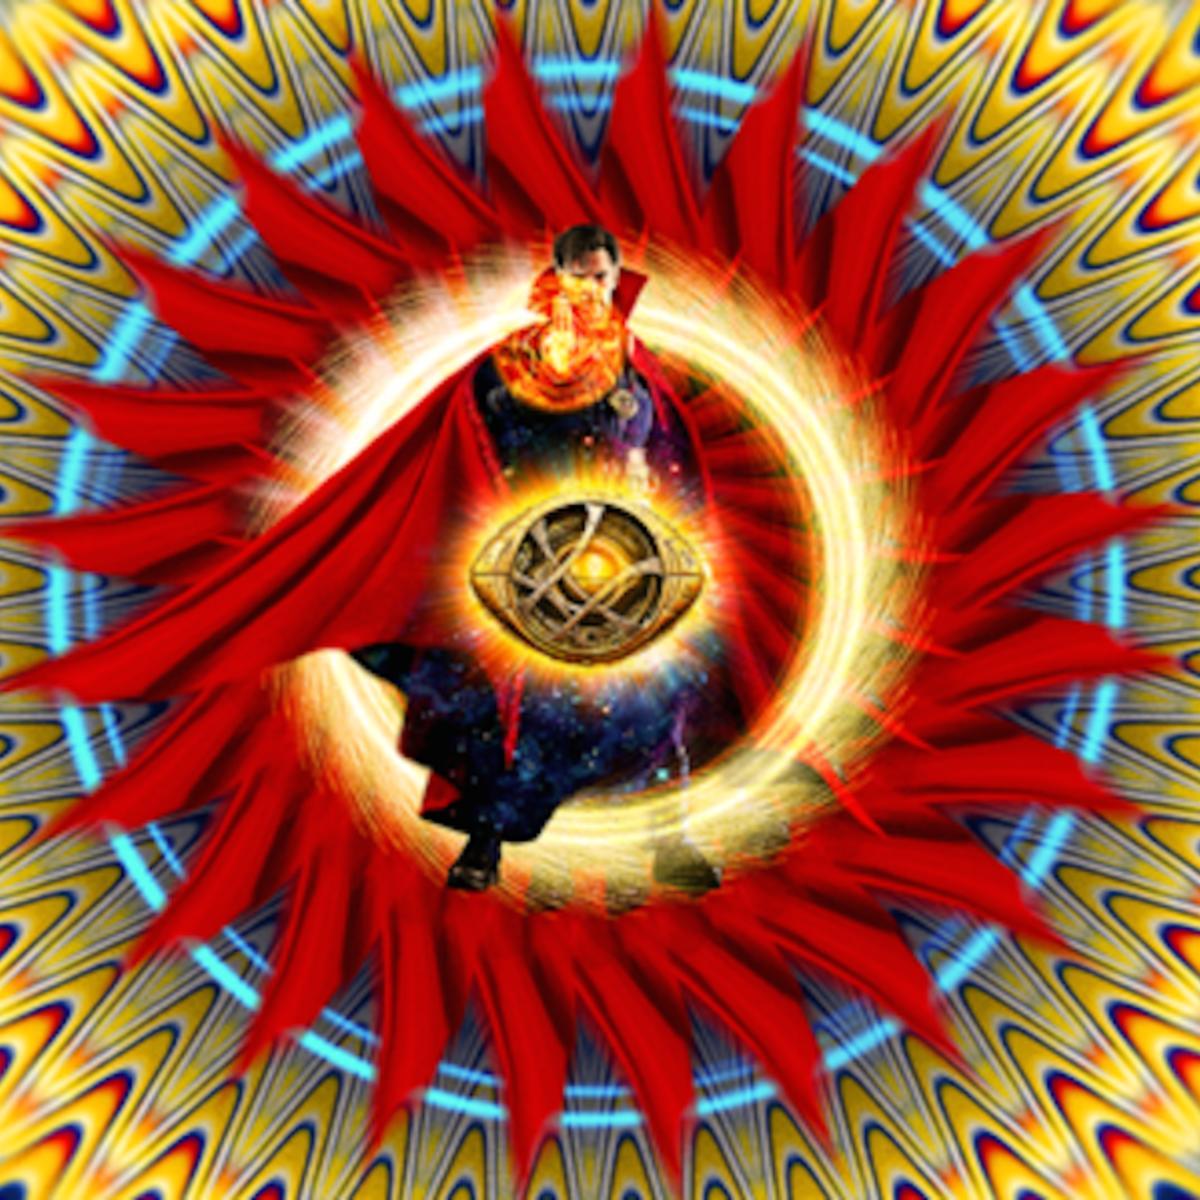 Dr-Strange-Marvel-Poster-Posse-John-Aslarona-683x1024_0.png